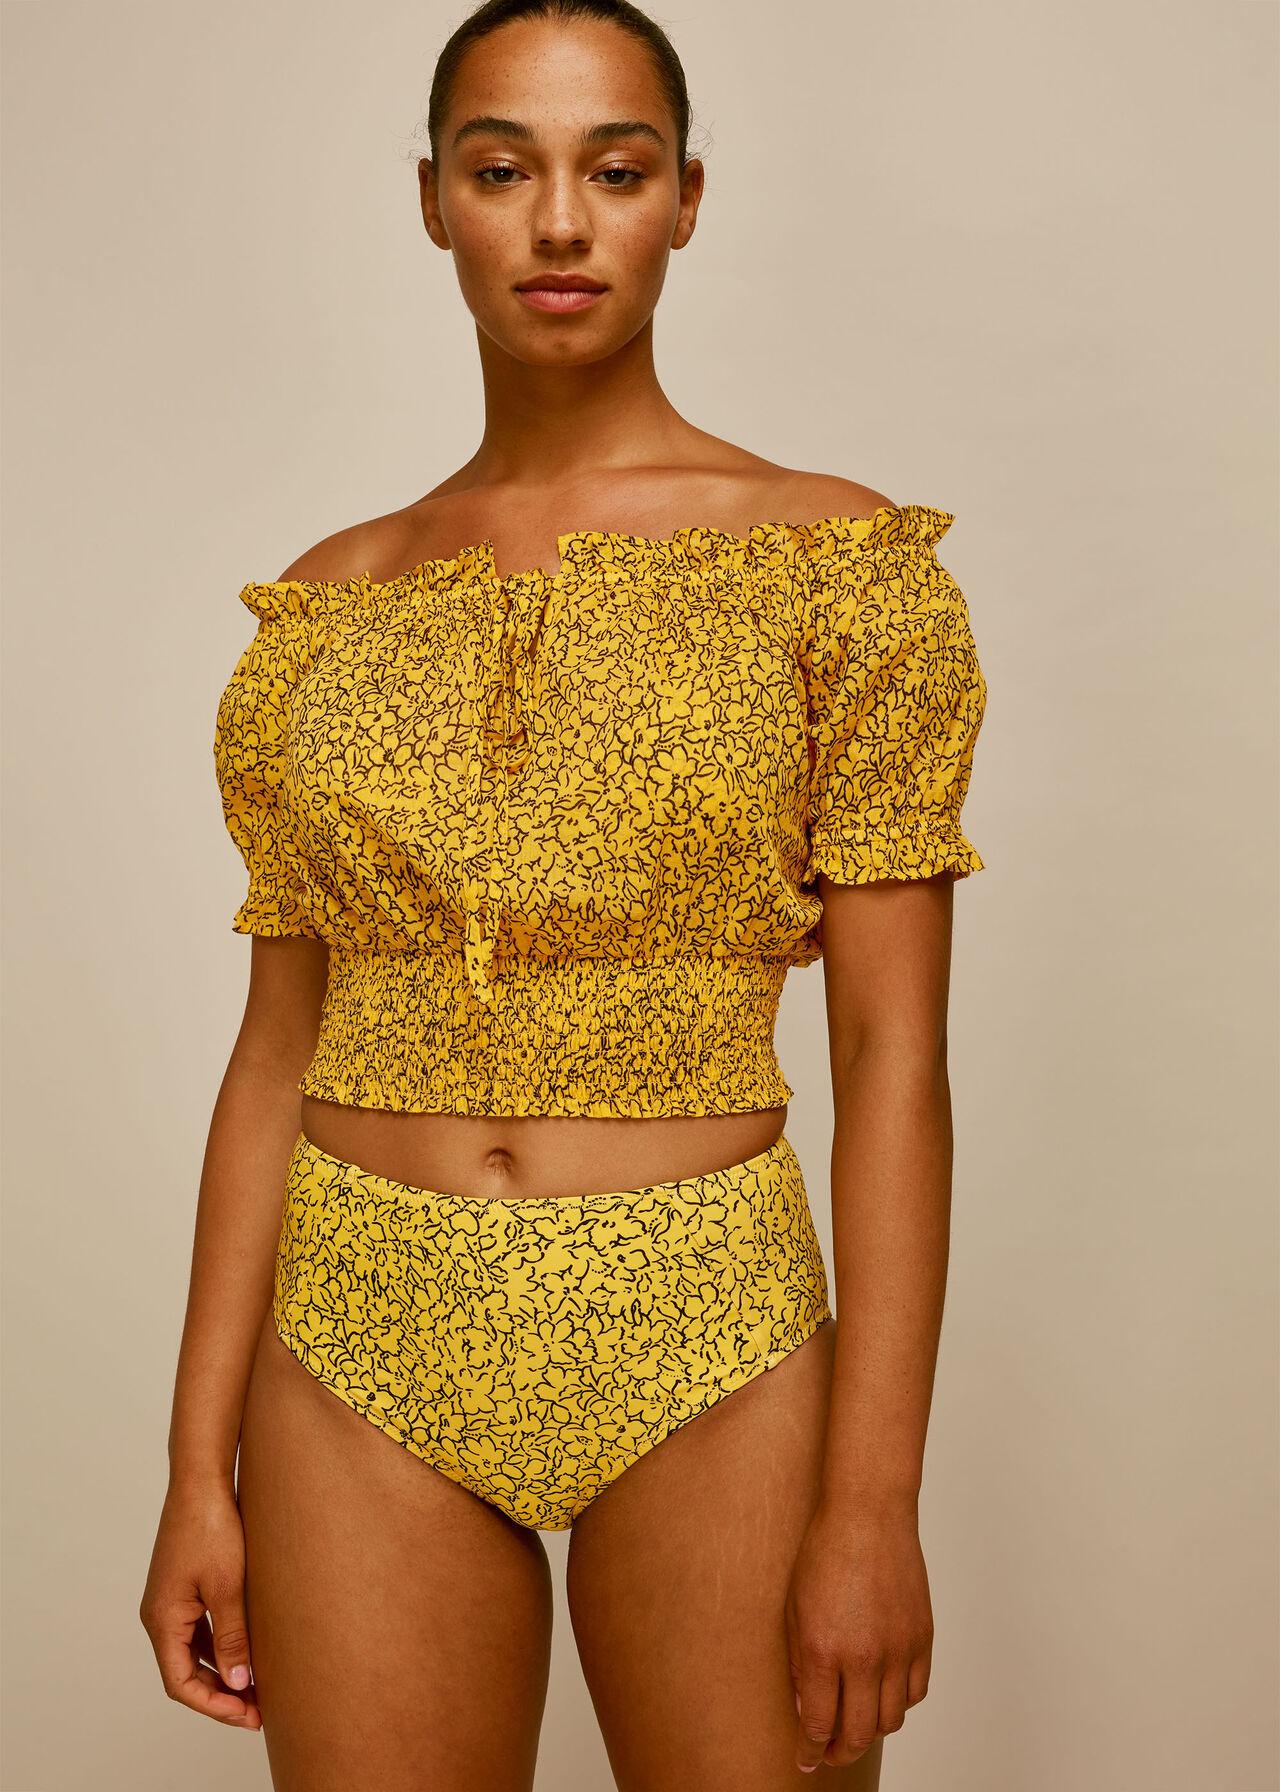 Floral Print Bikini Bottom Yellow